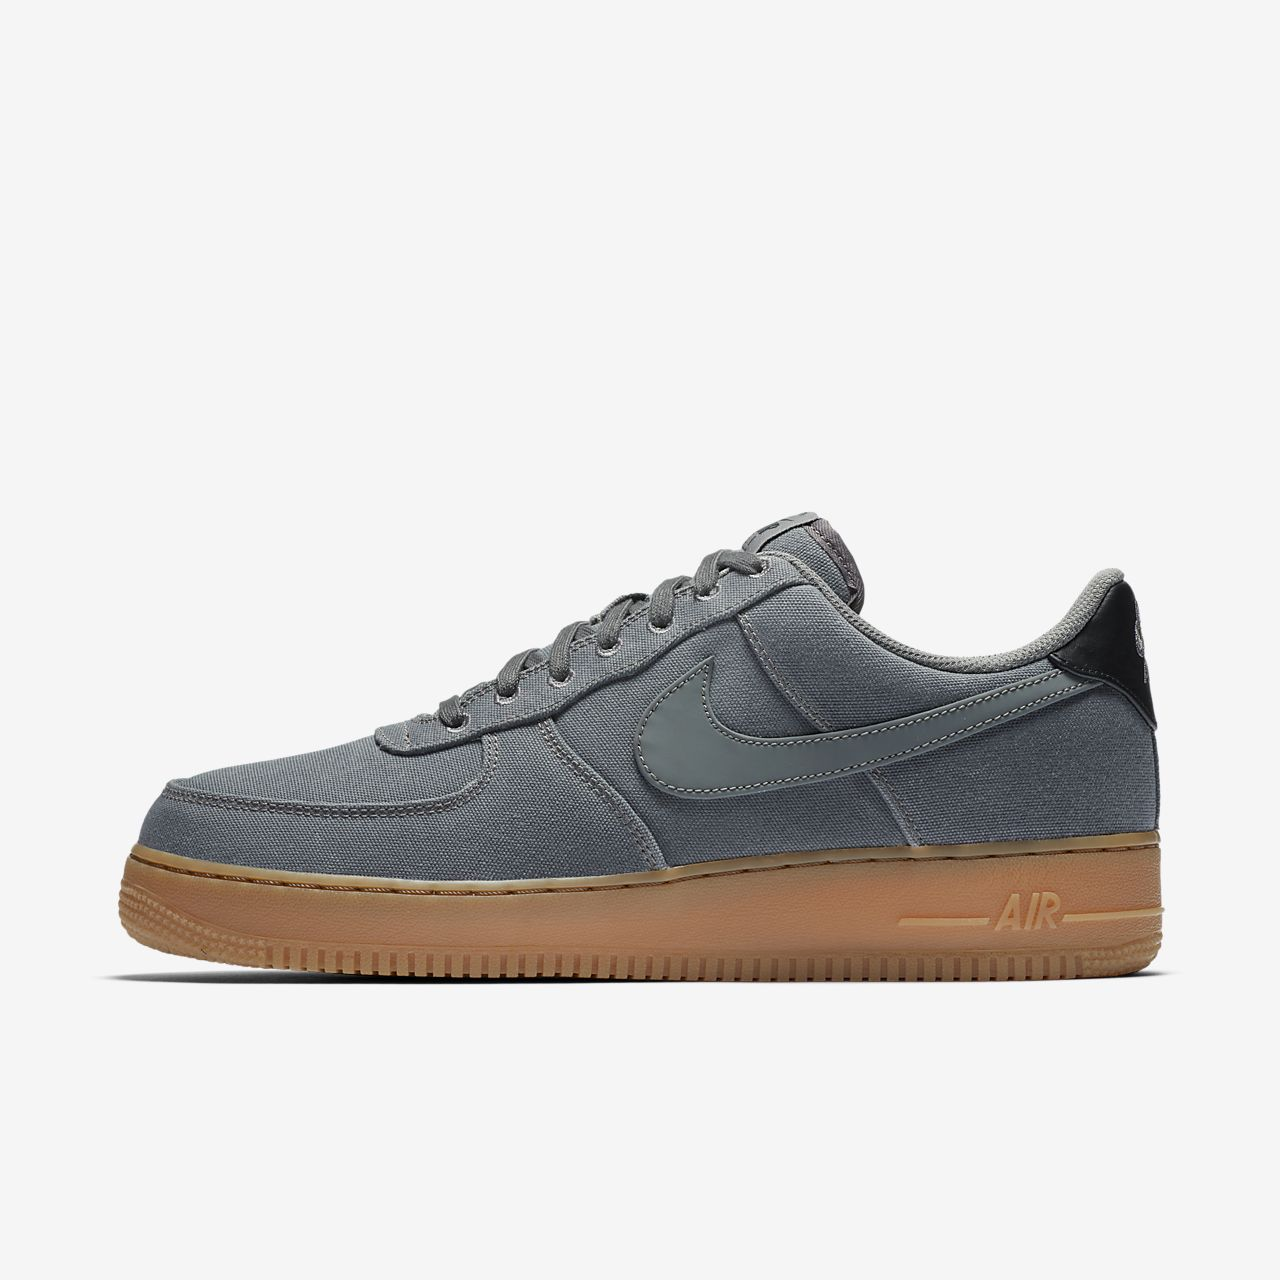 meet f168b bea38 ... Nike Air Force 1 07 LV8 Style-sko til mænd